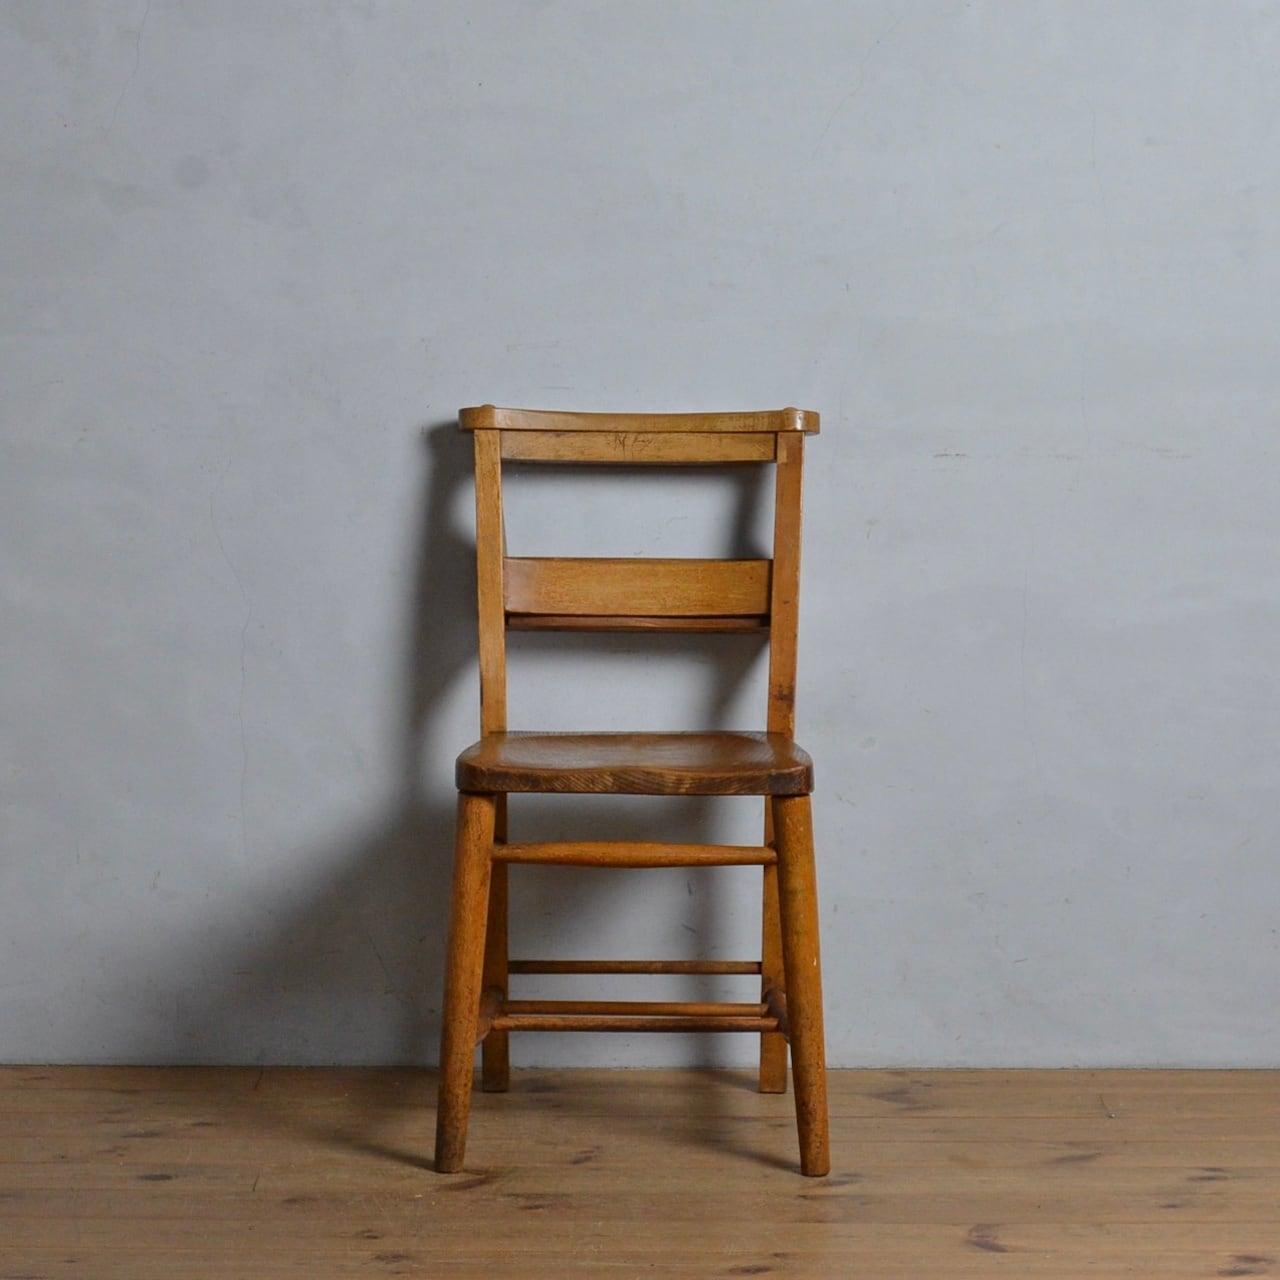 Church Chair / チャーチチェア 【B】〈チャペルチェア・ダイニングチェア・デスクチェア・椅子〉112177